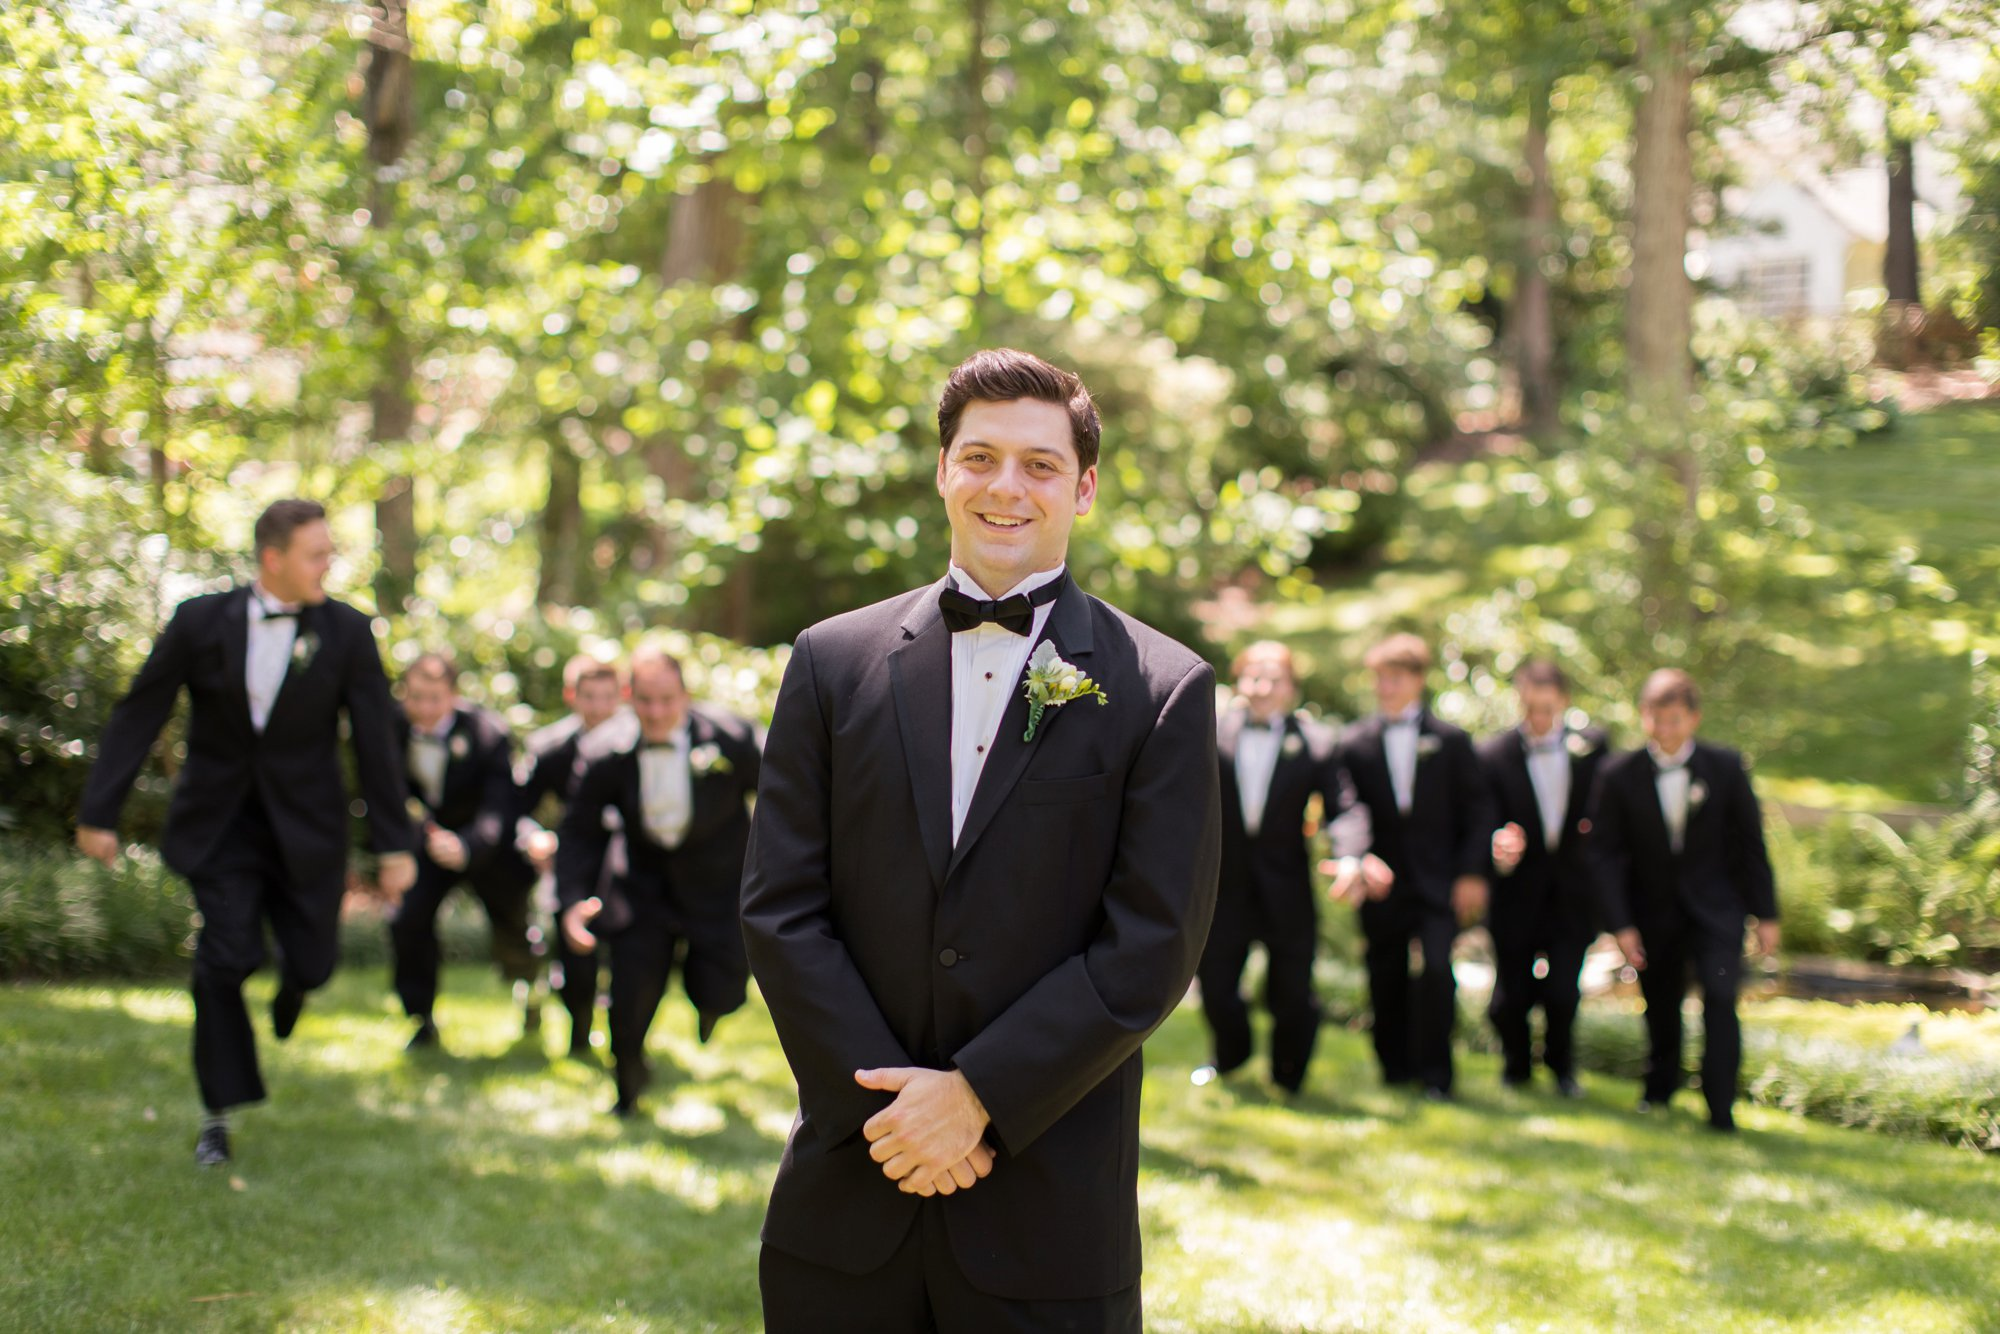 wedding-photography-88-love-stories_0019.jpg